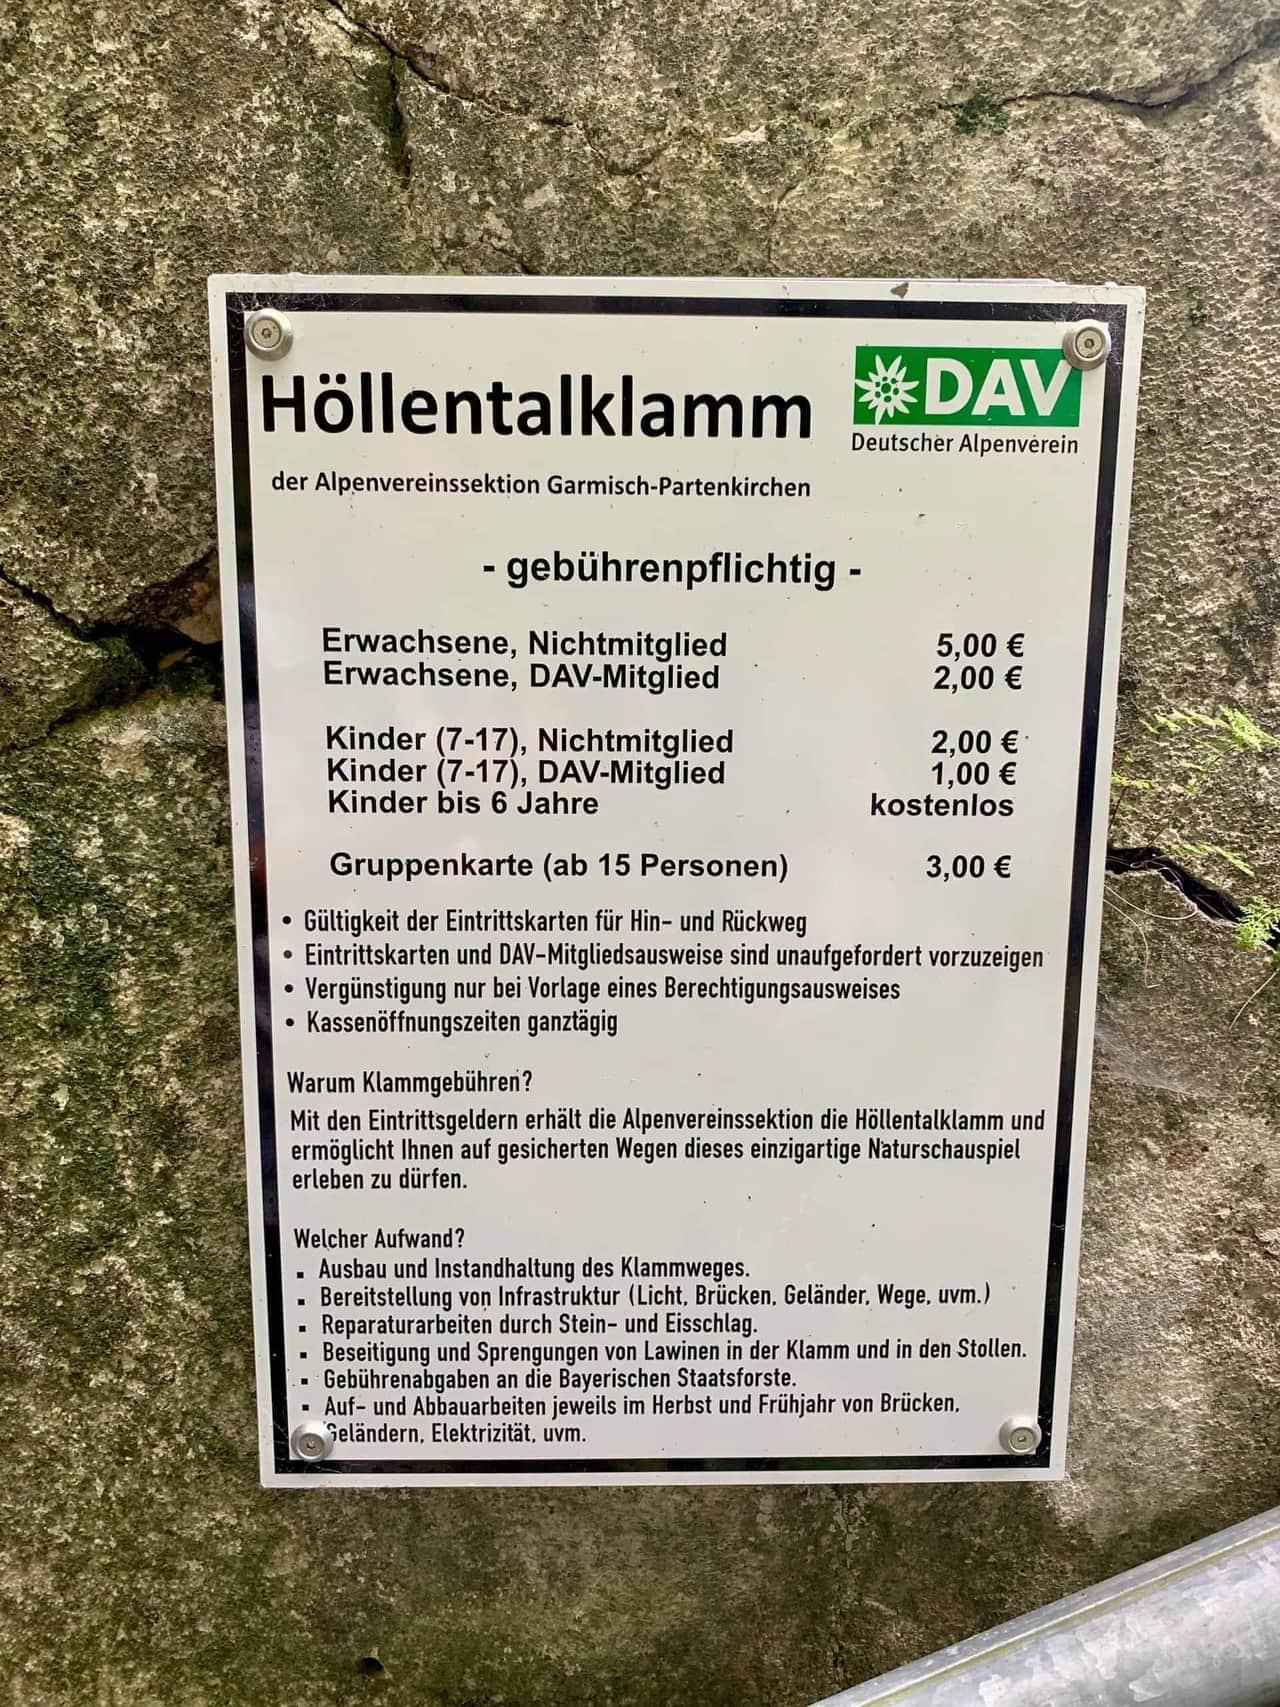 Höllentalklamm_Preisliste_DAV